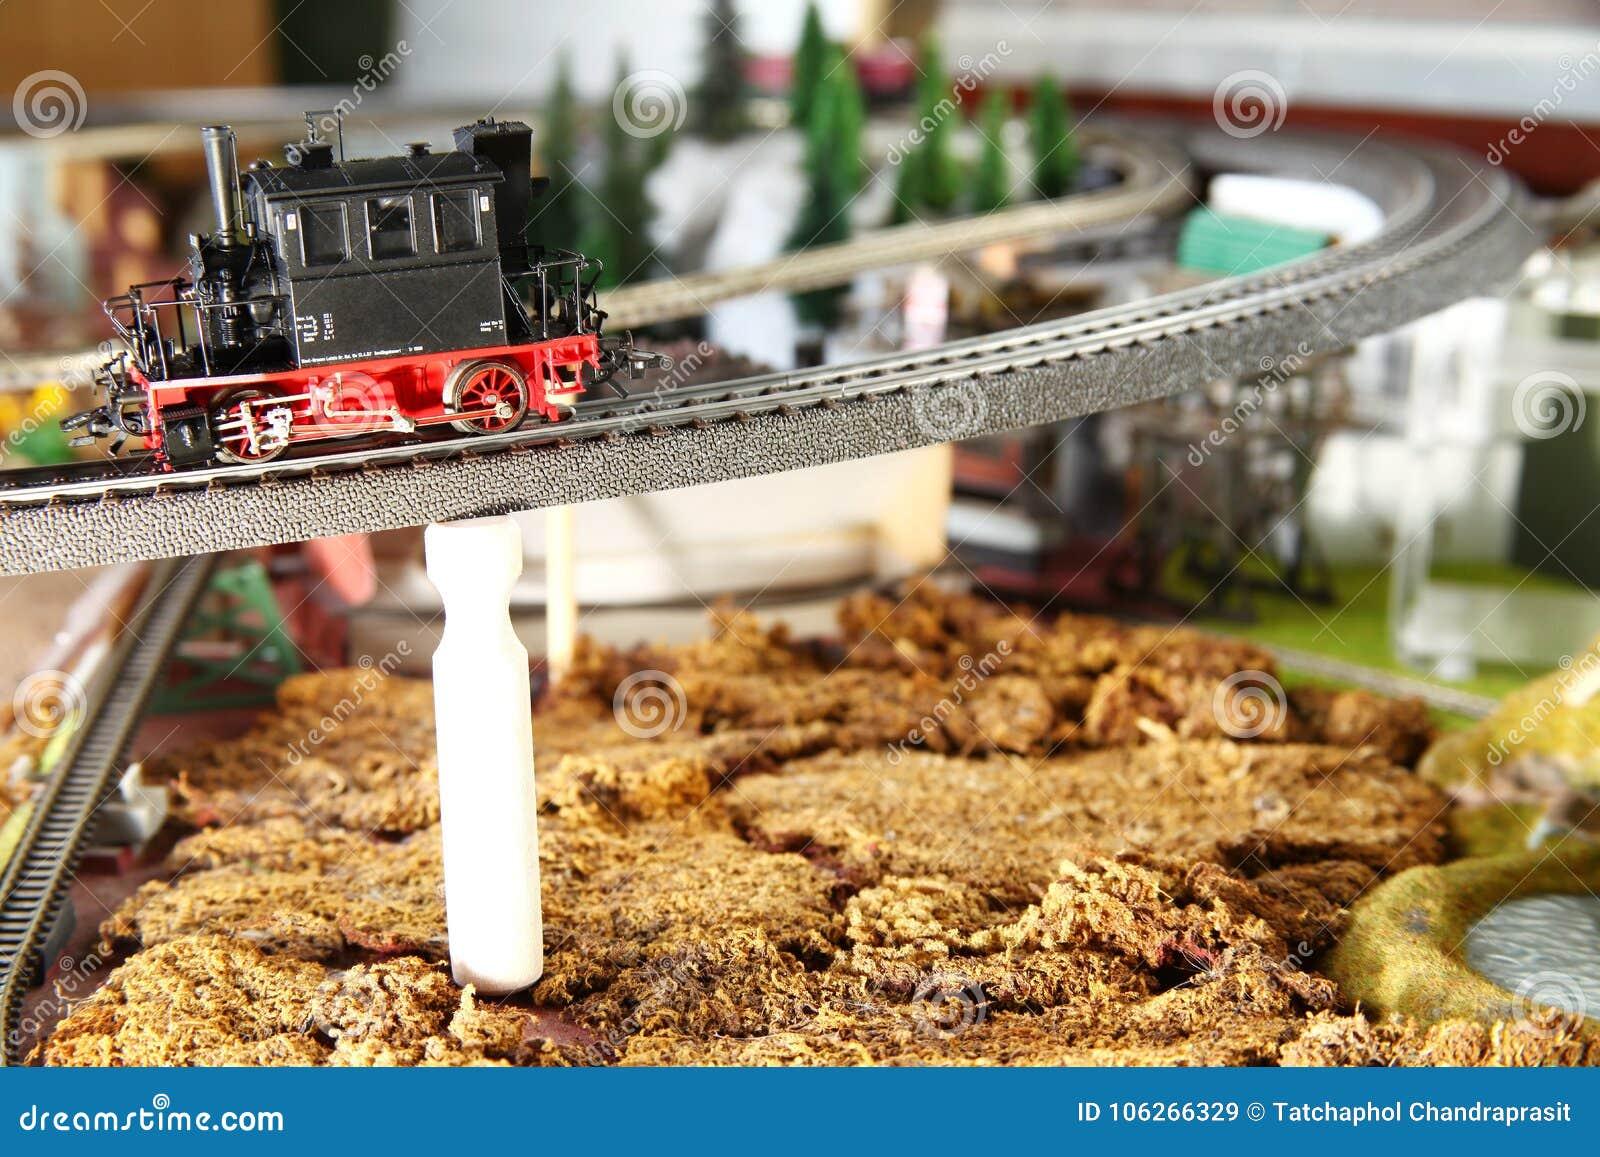 Ferrocarril modelo en la escena modelo miniatura de la ciudad